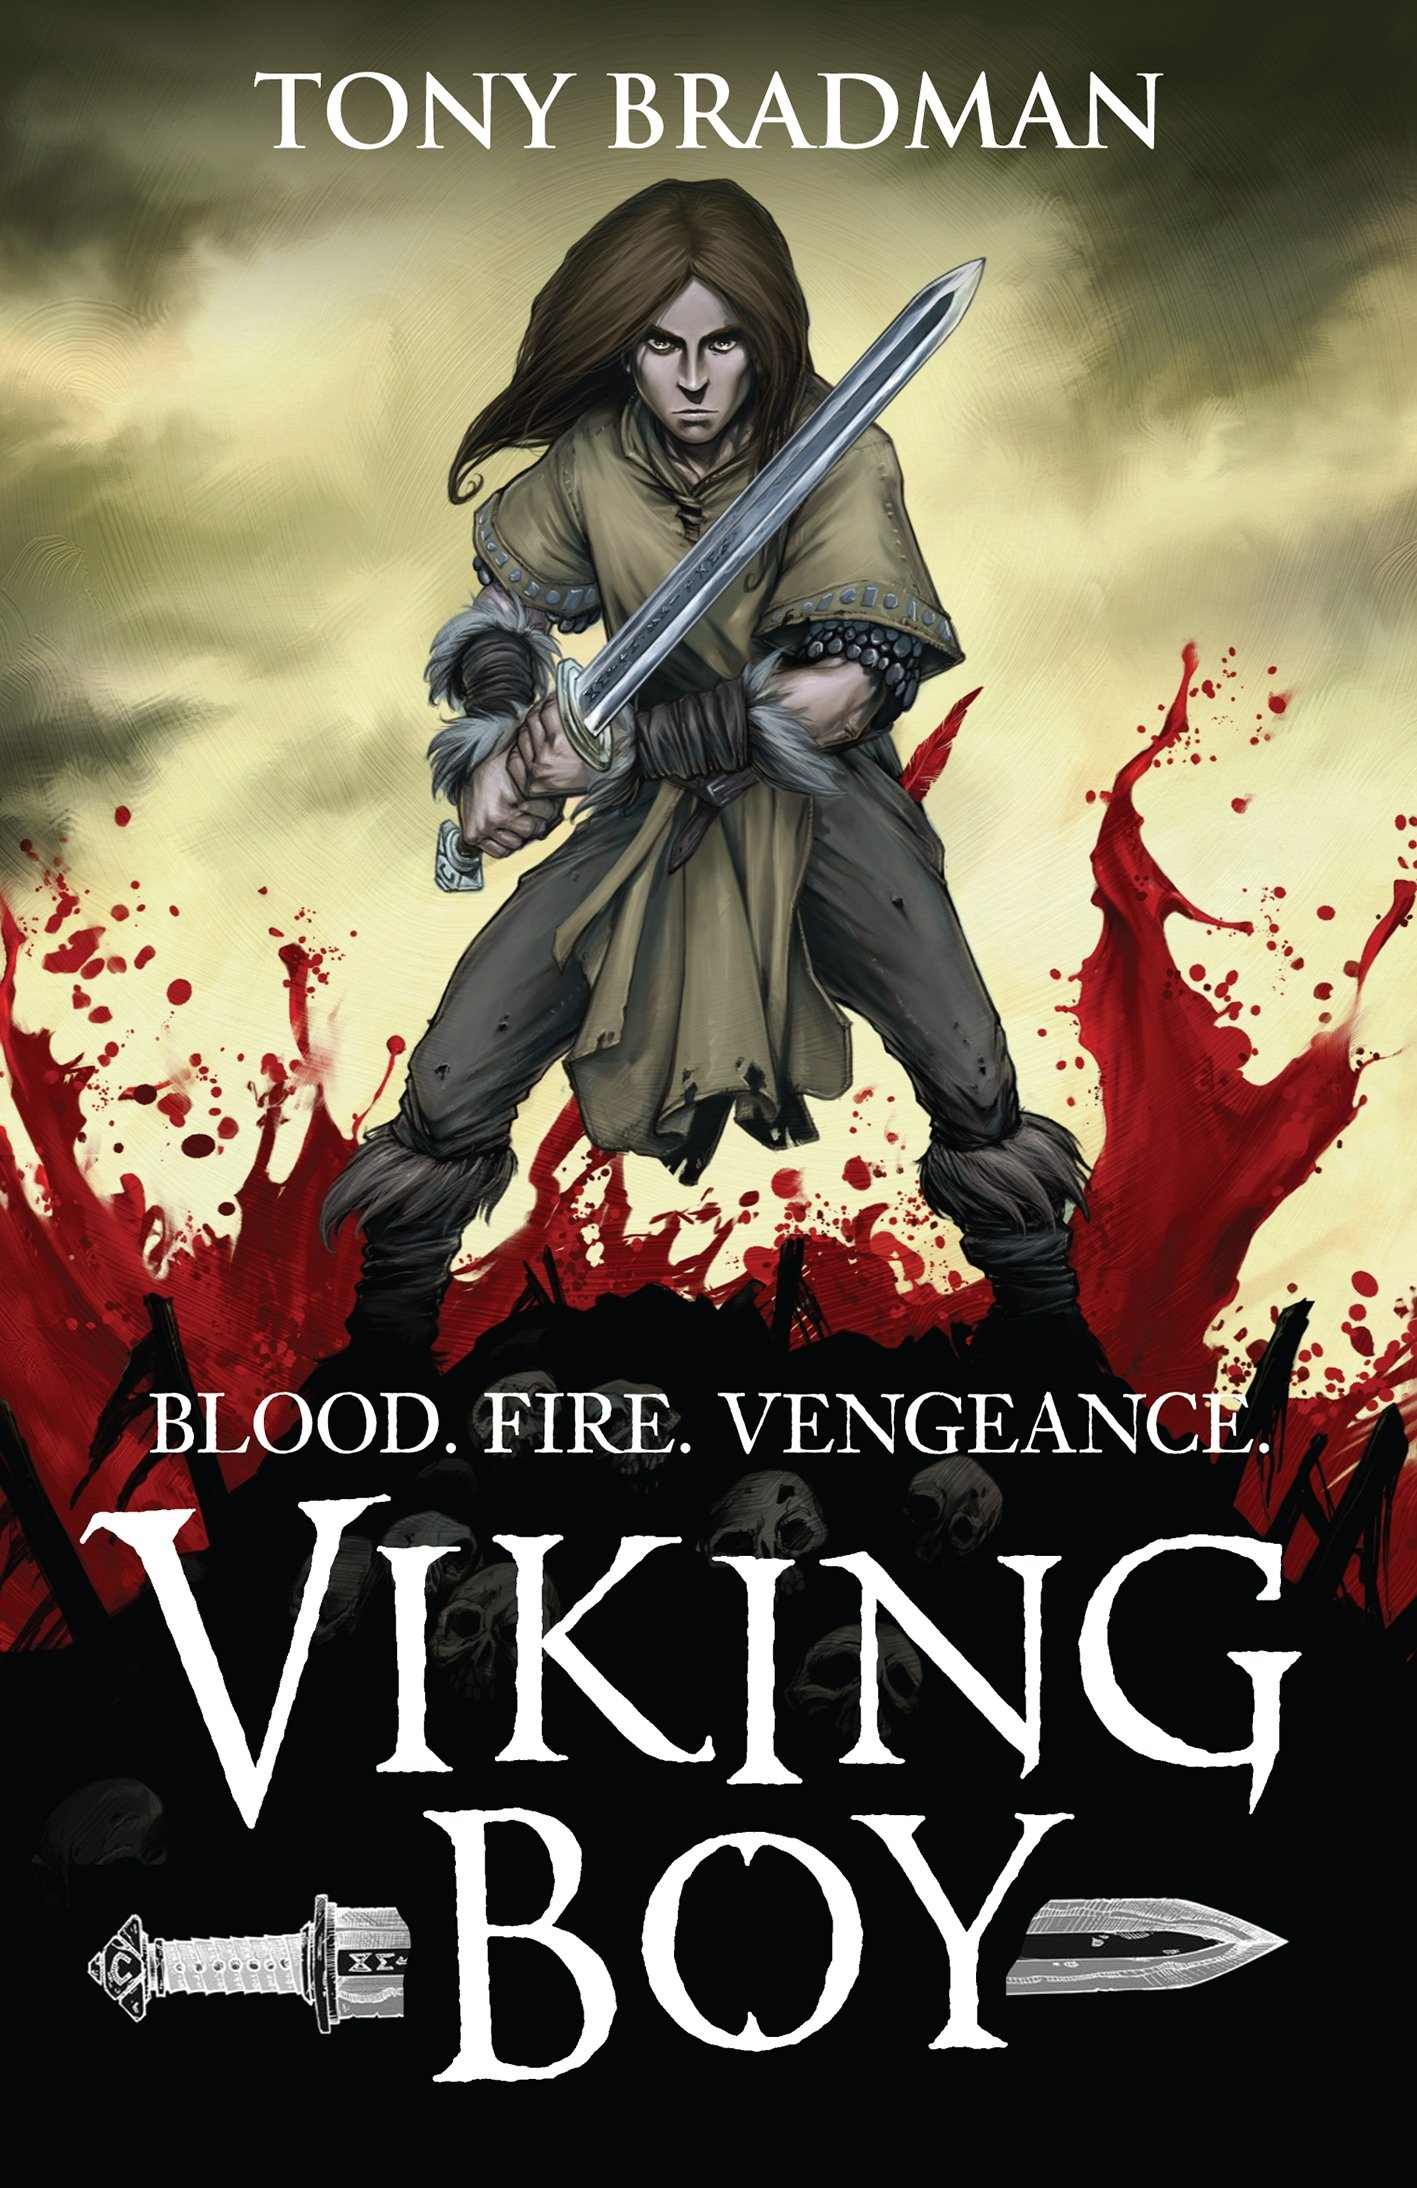 Viking Boy : Bradman, Tony, Goux, Pierre-Denis: Amazon.co.uk: Books